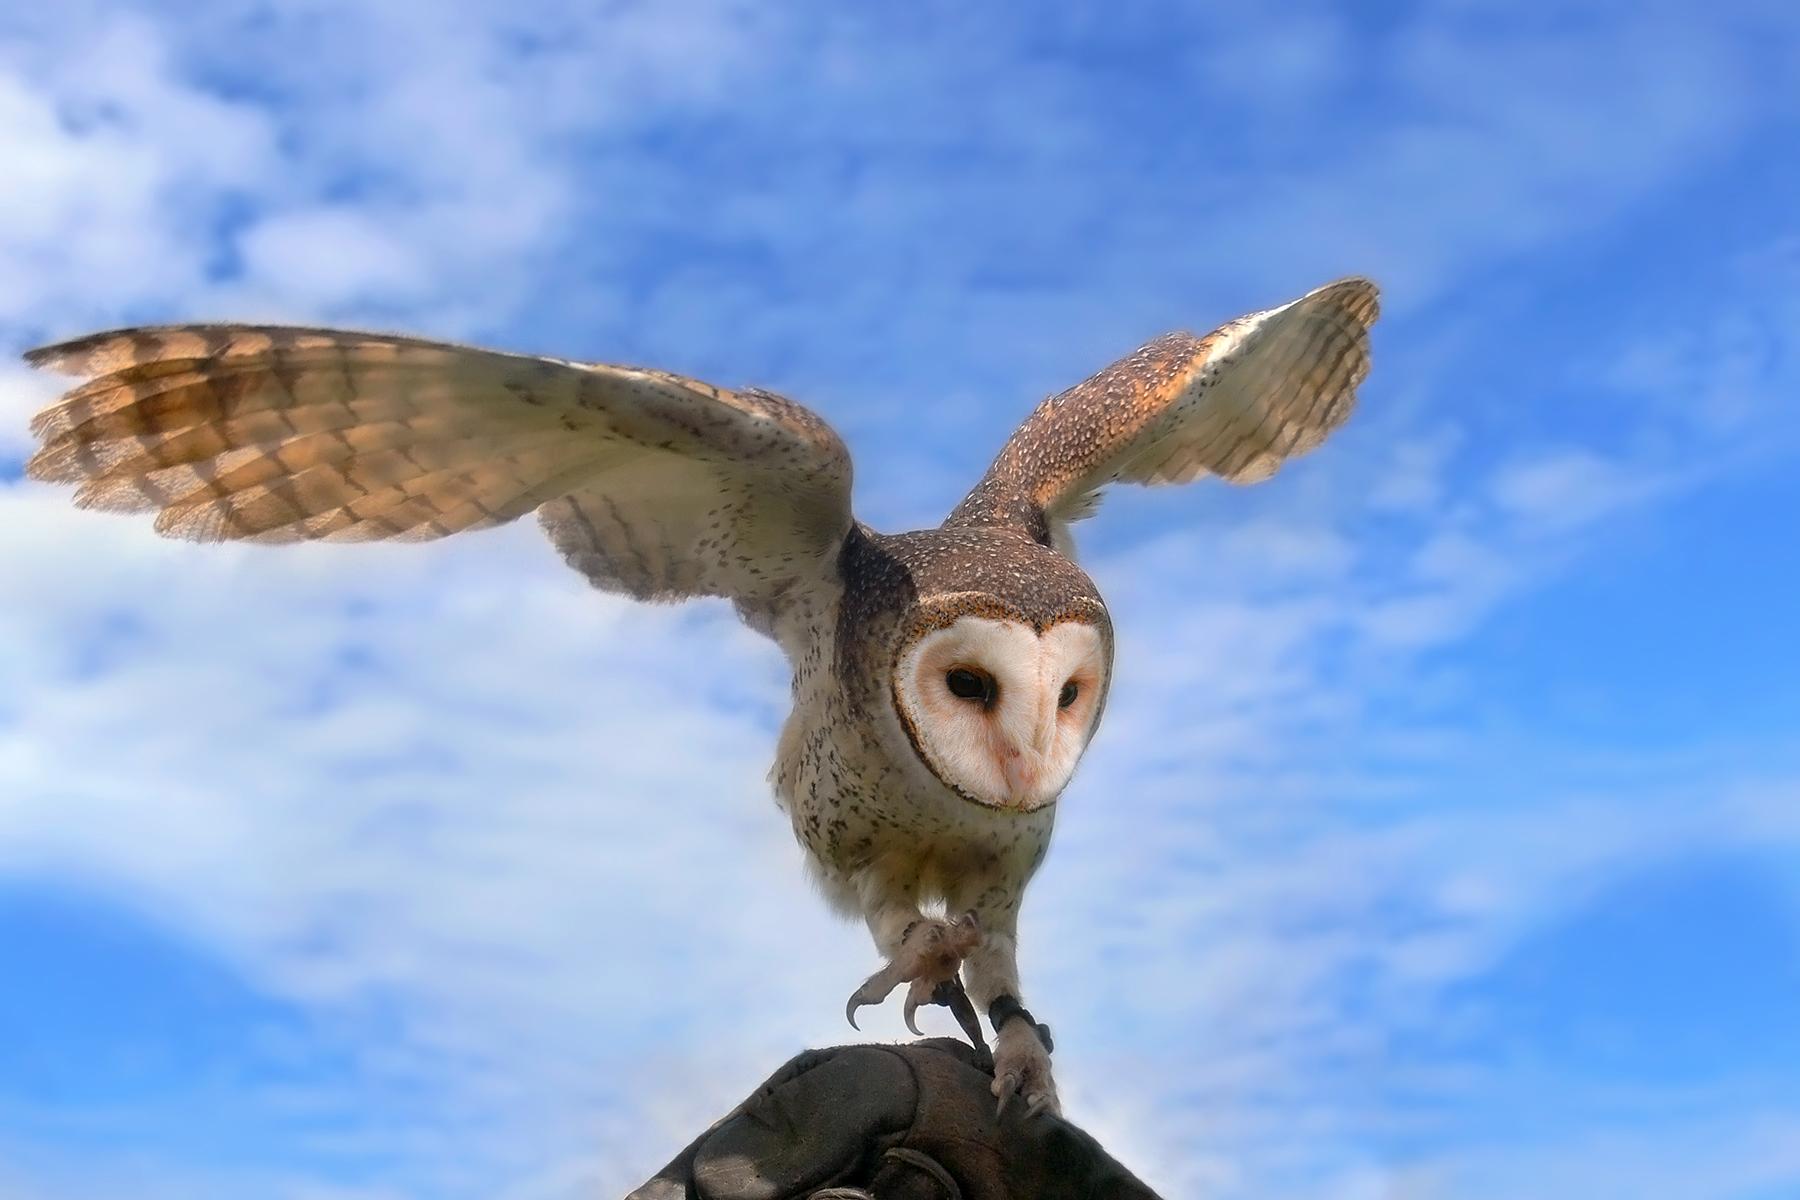 File:Masked owl landing.jpg - Wikimedia Commons